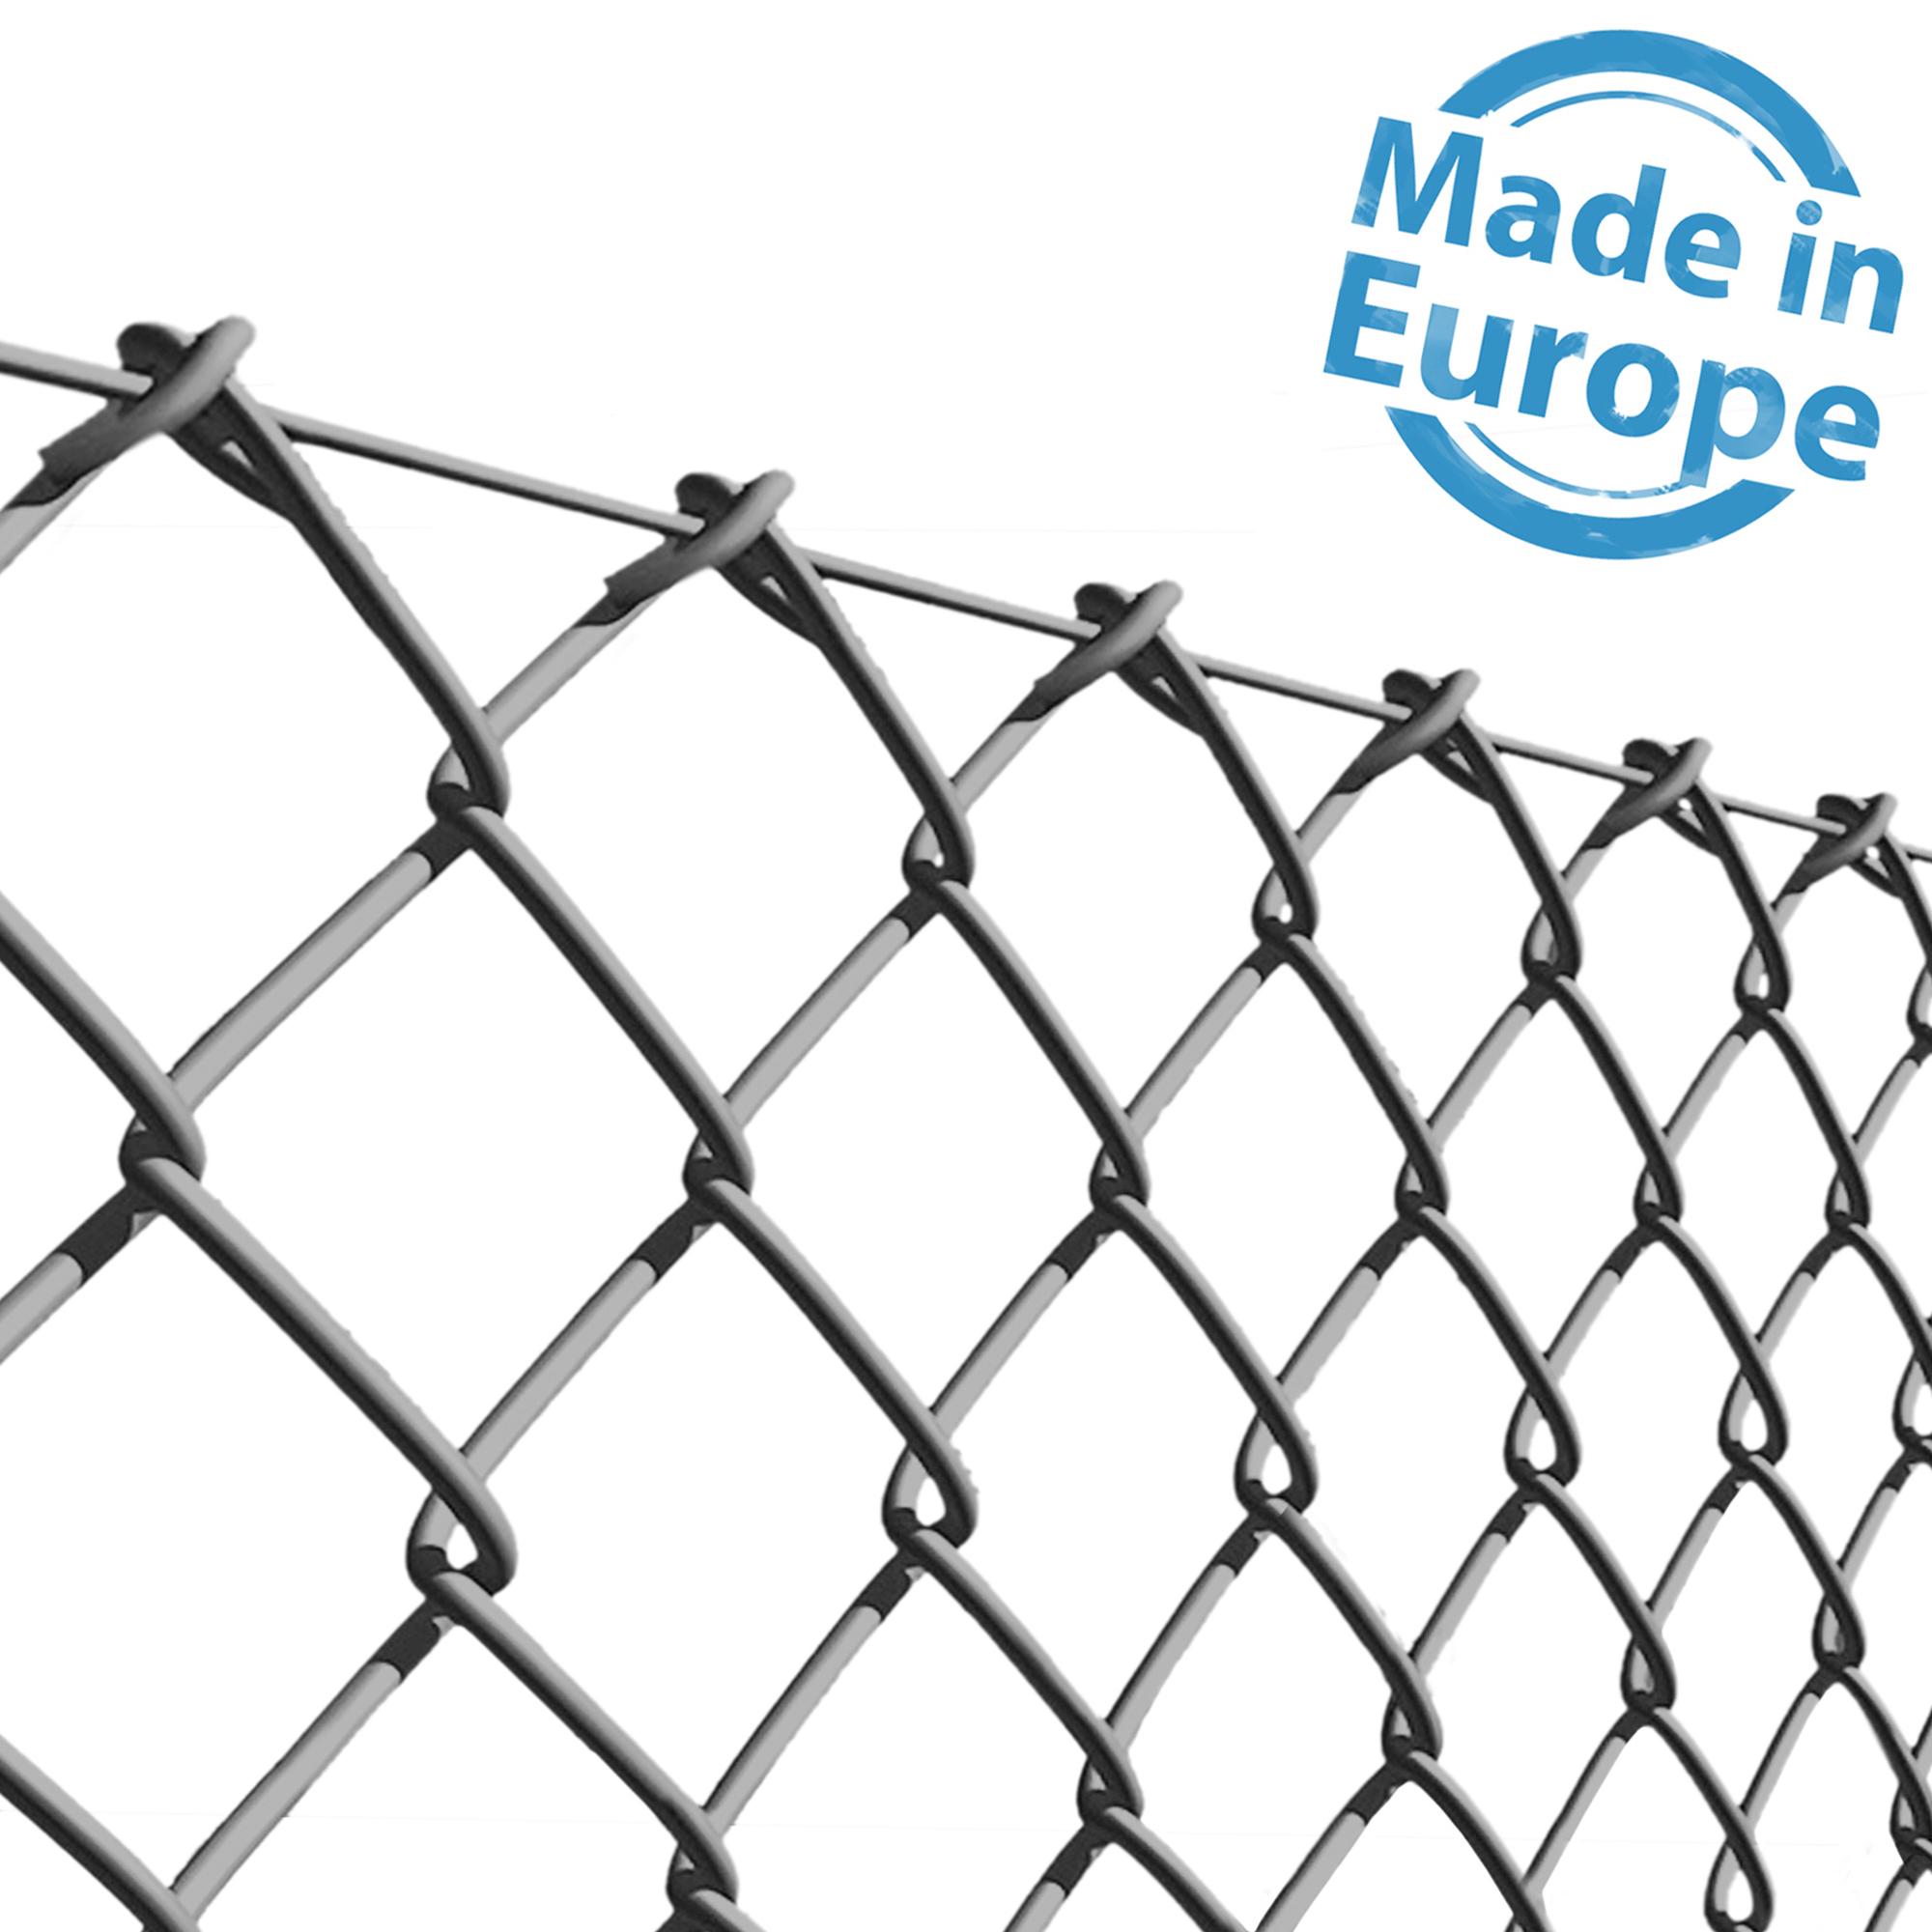 galvanized-steel-chain-link-fence